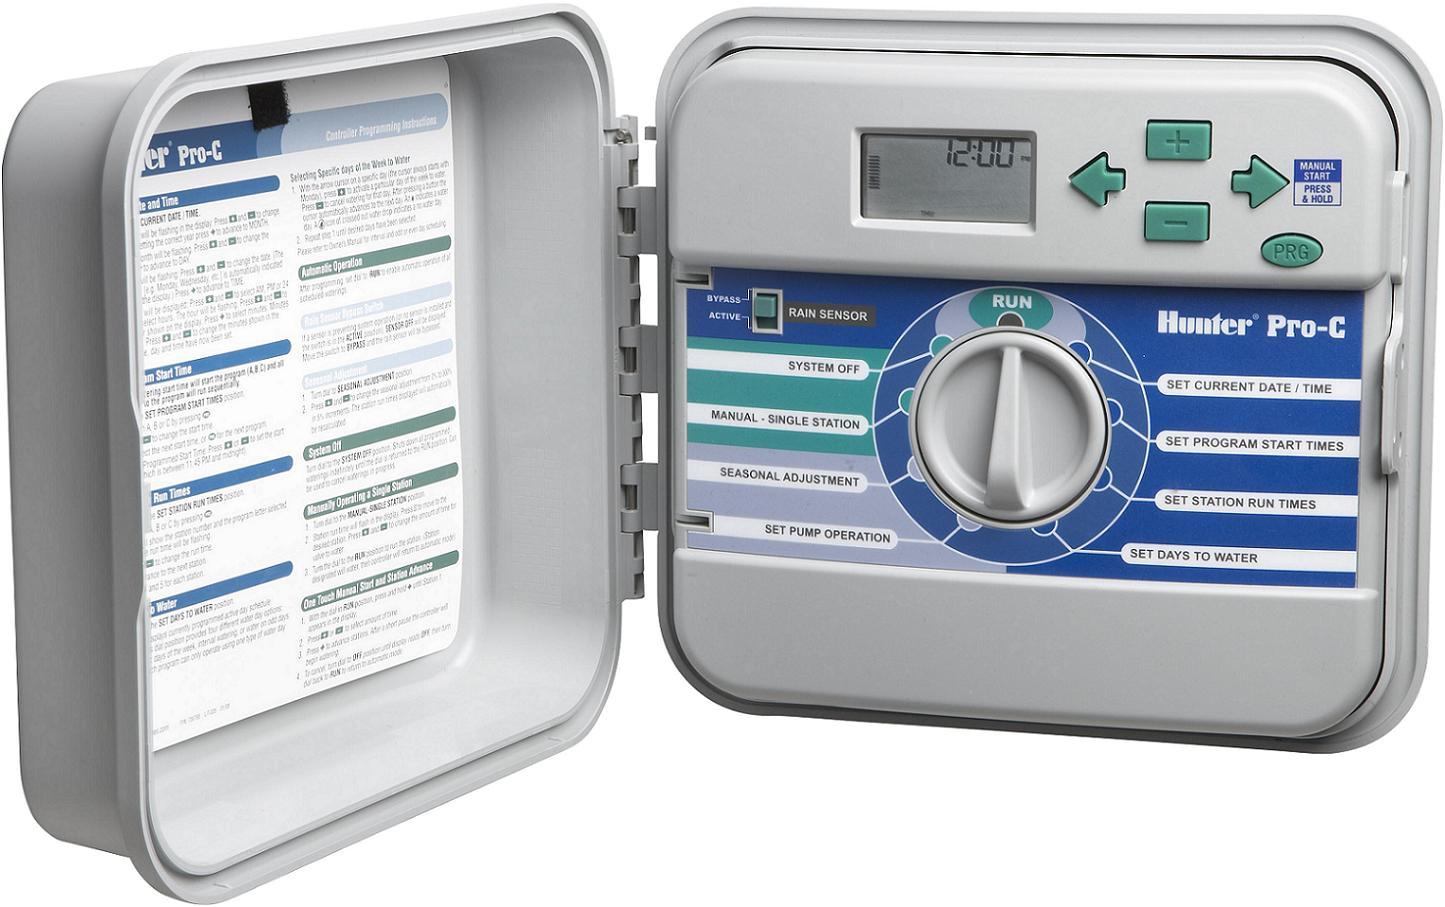 Hunter Pro C Sprinkler Controller Manual Valve Box Large Rectangle Heavy Duty Complete Vblrehdc Bidgee